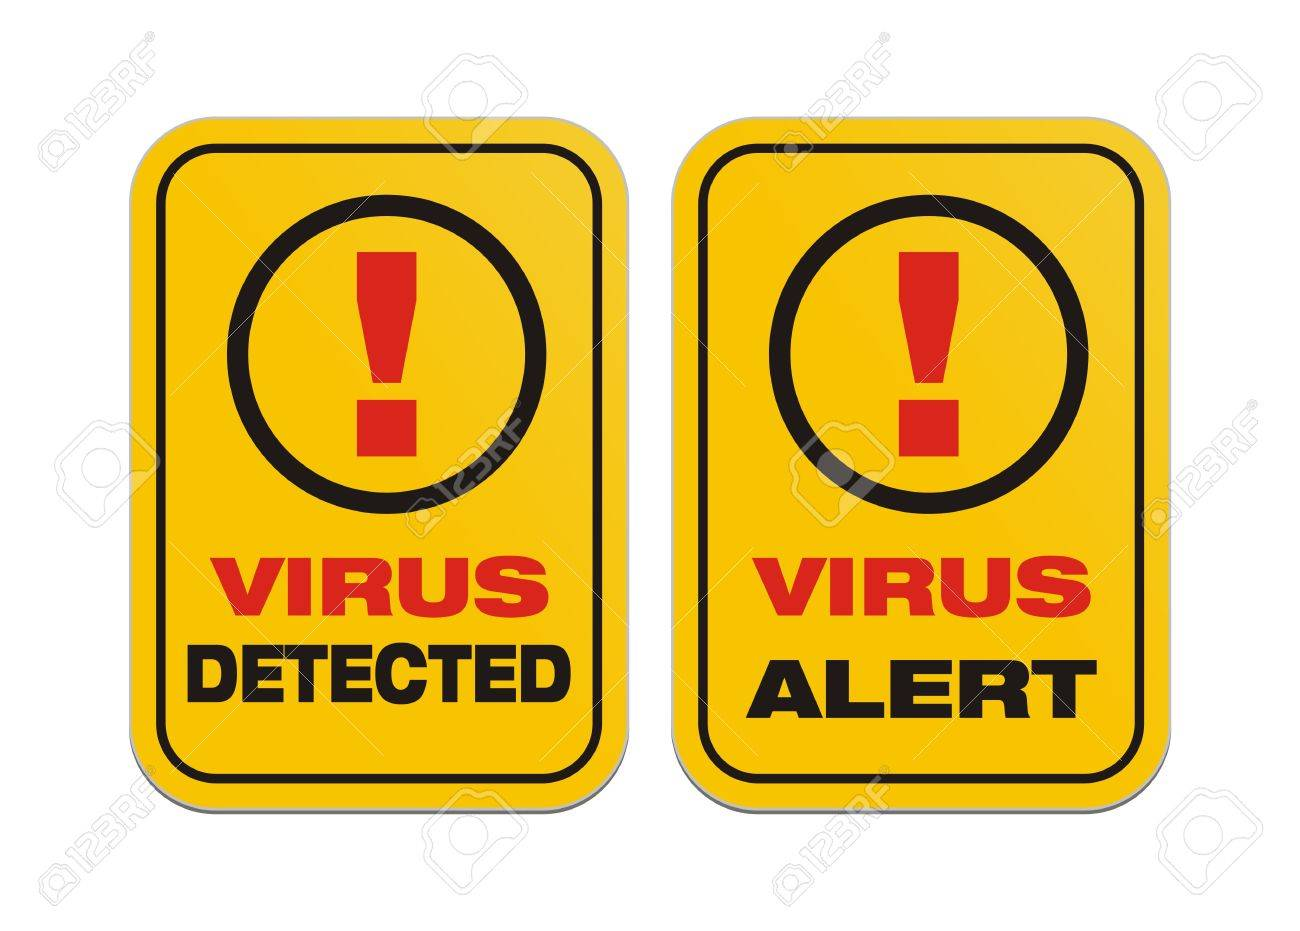 virus alert, virus detected - yellow signs Stock Vector - 20363572